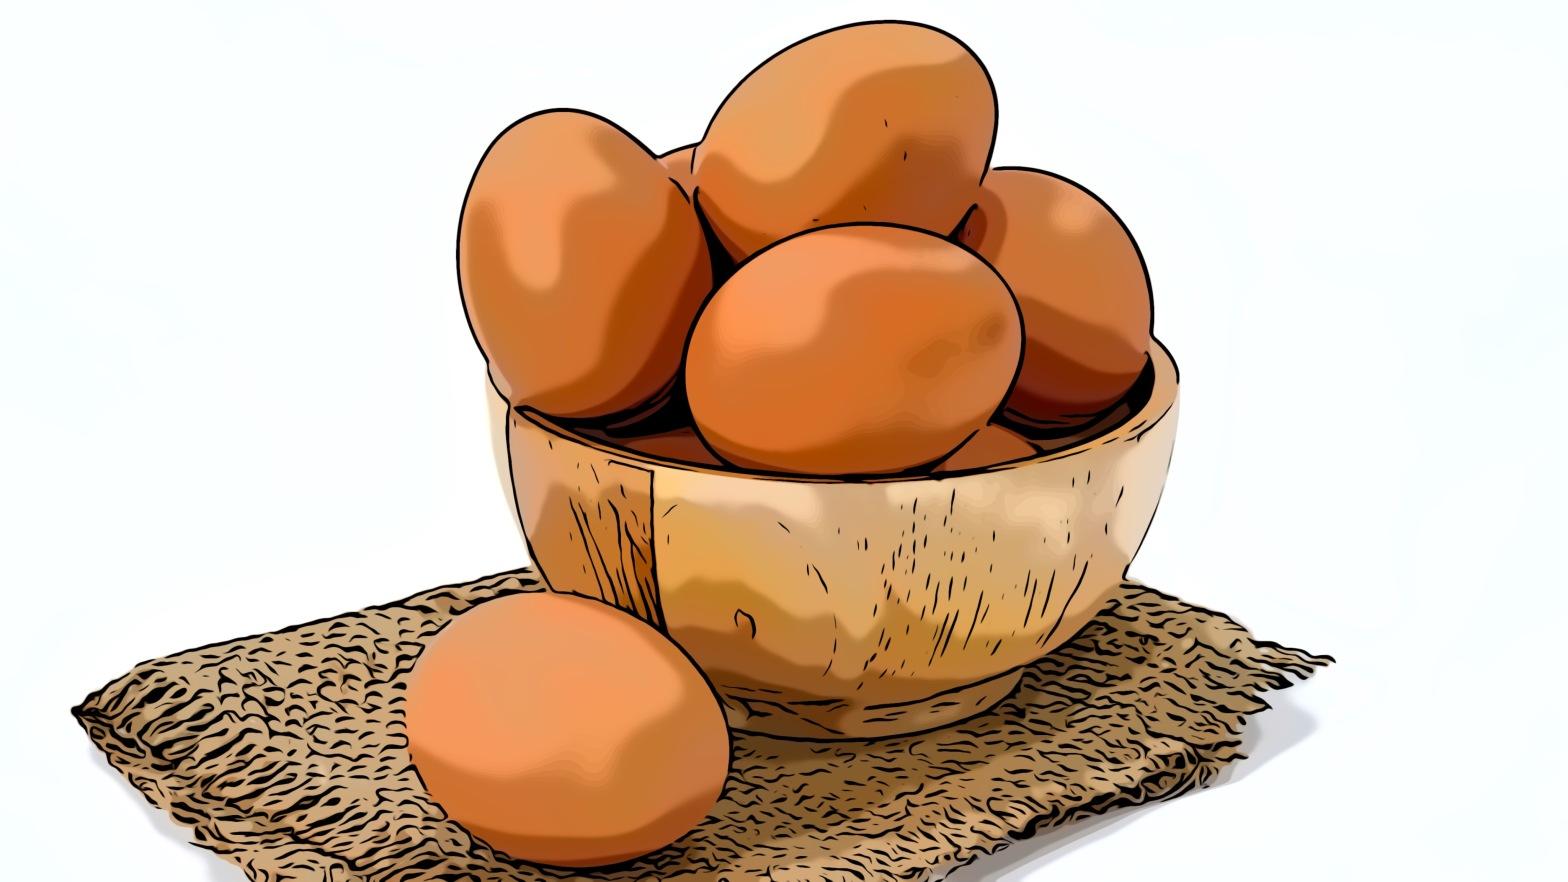 Eggs header comic